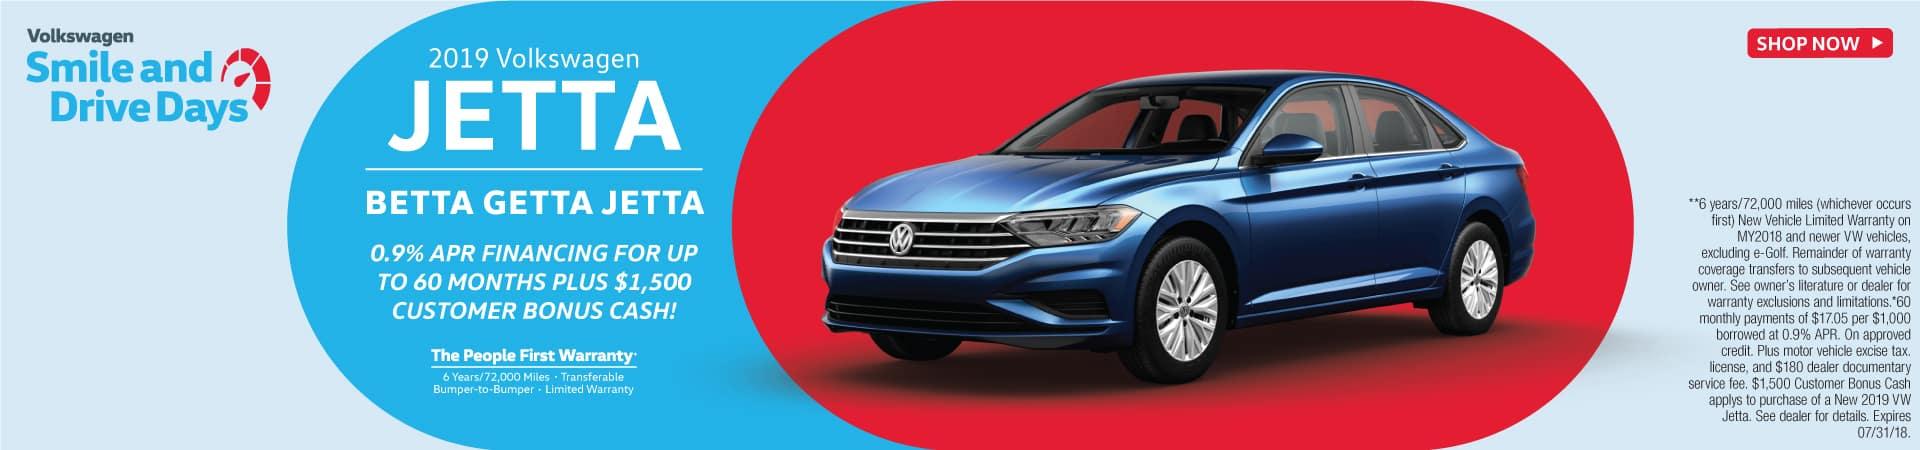 Volkswagen las cruces 2017 2018 2019 volkswagen reviews for Lithia motors des moines